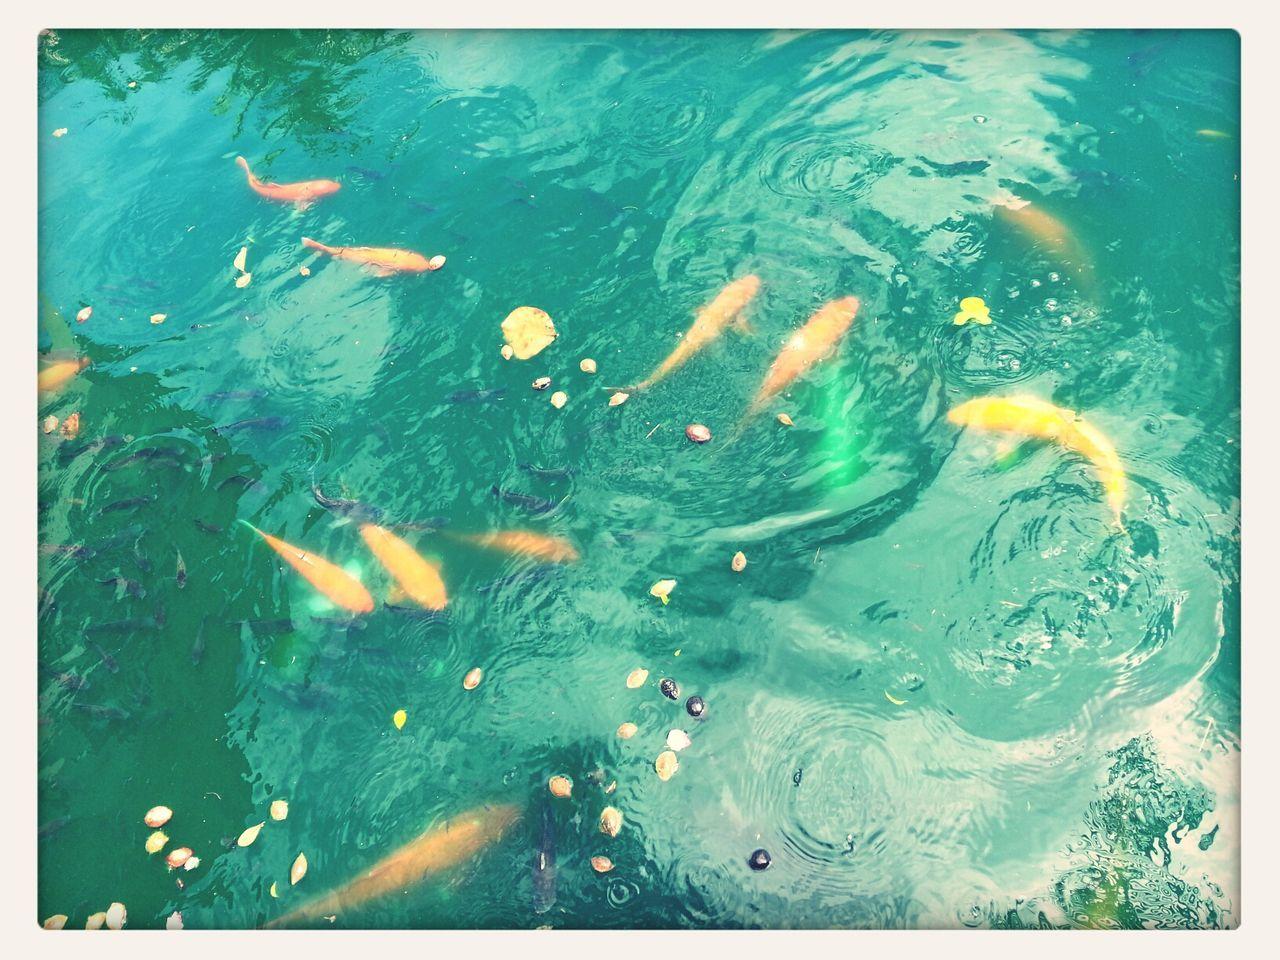 Goldfish in the lake